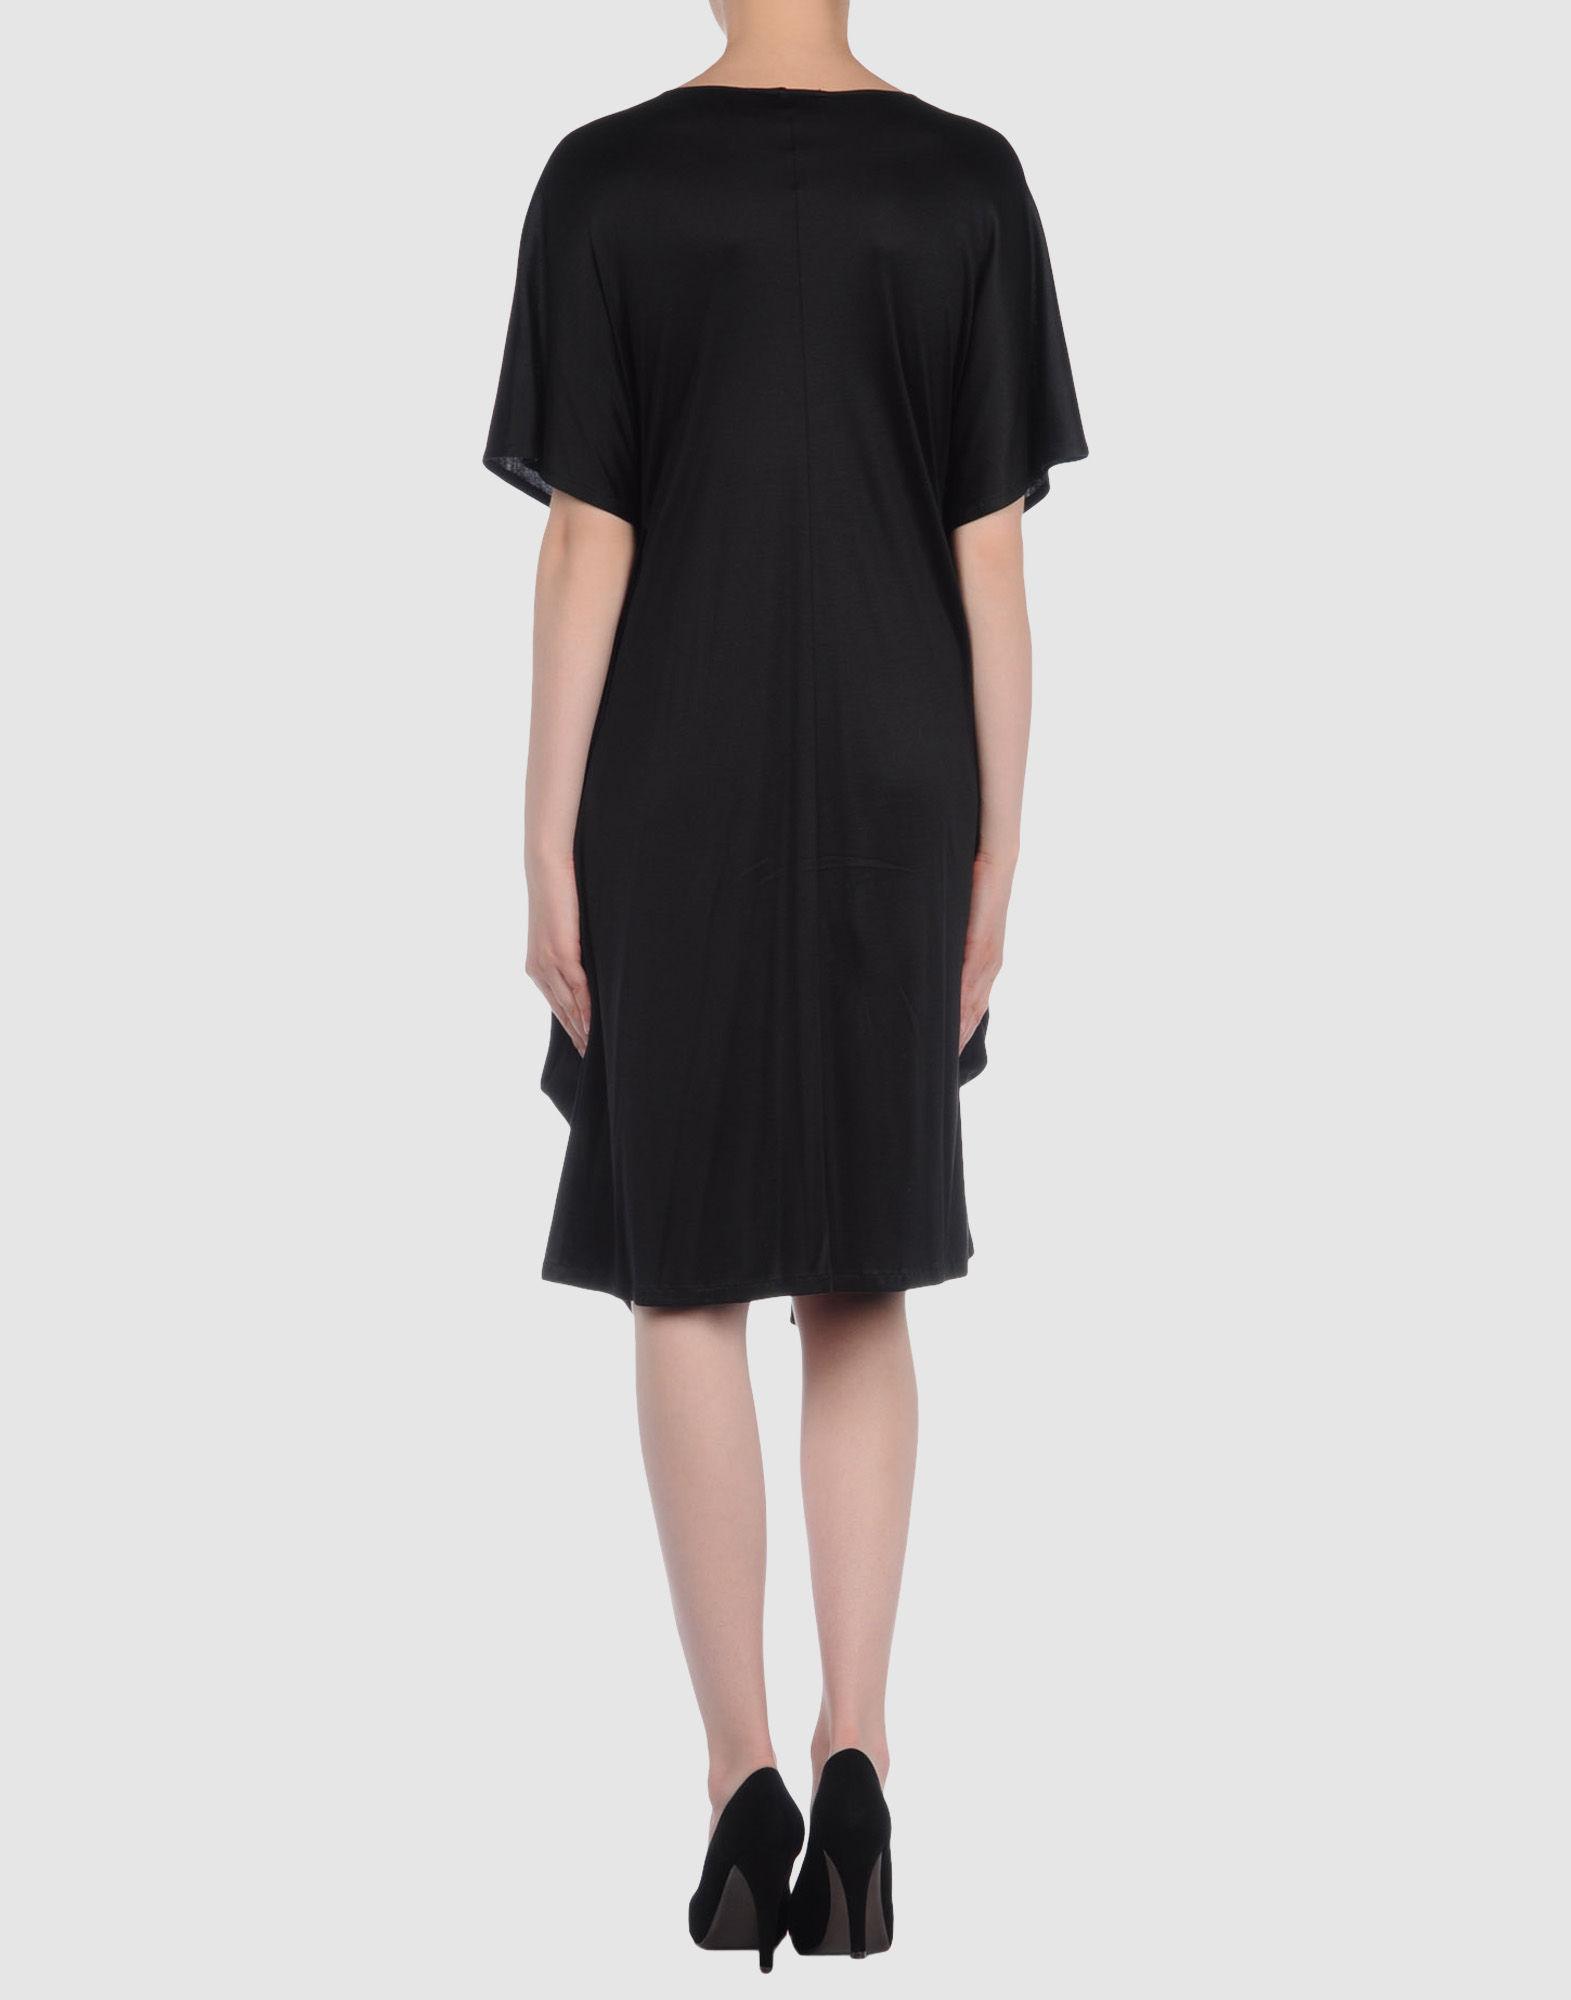 34220383IX 14 r - Βραδυνα Φορεματα Yves Saint Laurent Rive Gauche Κωδ.30